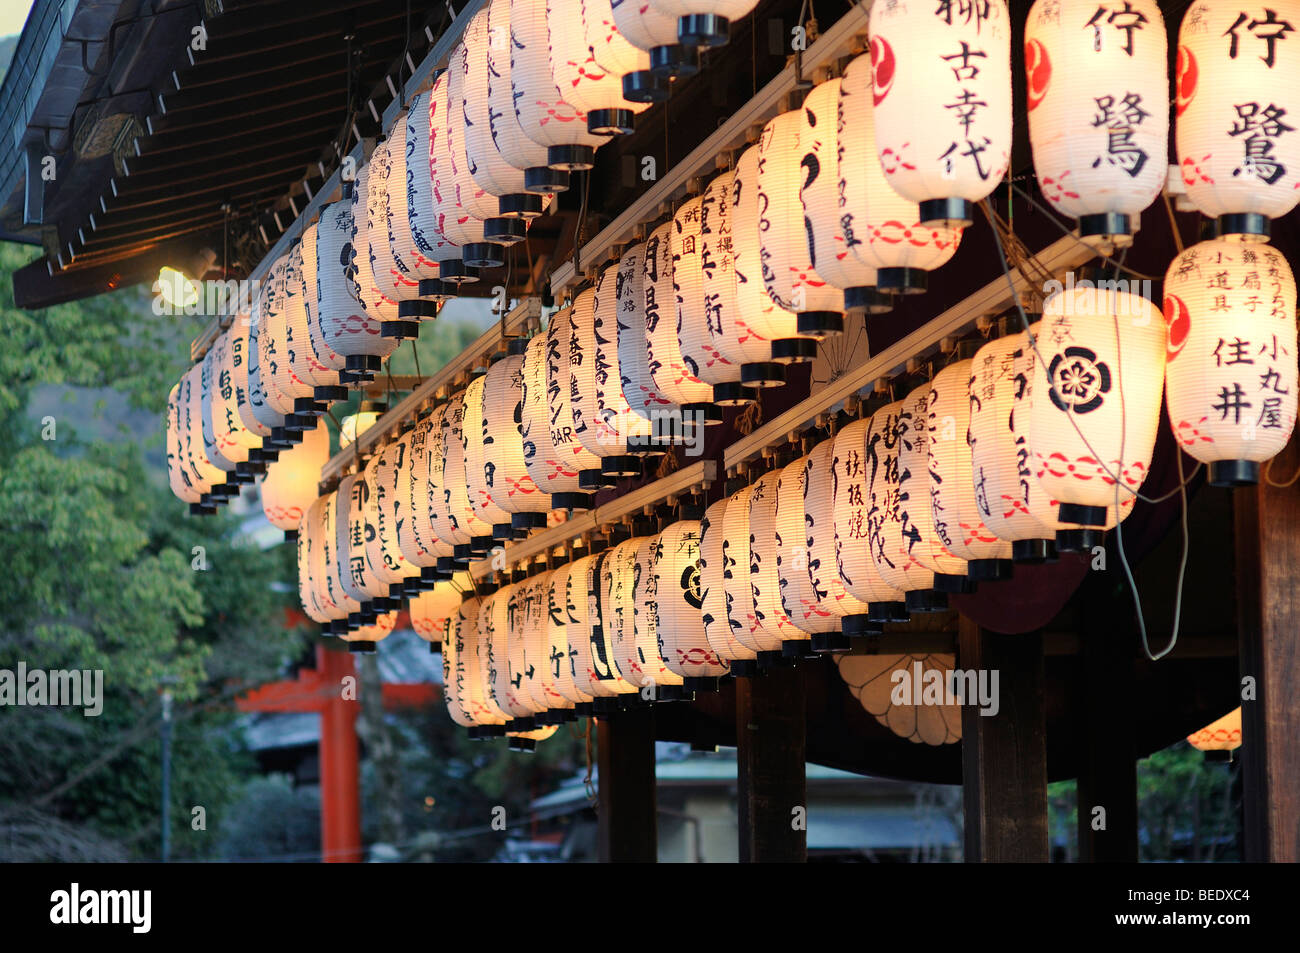 Burning lanterns in the Yasaka Shrine in Kyoto, Japan, East Asia, Asia - Stock Image